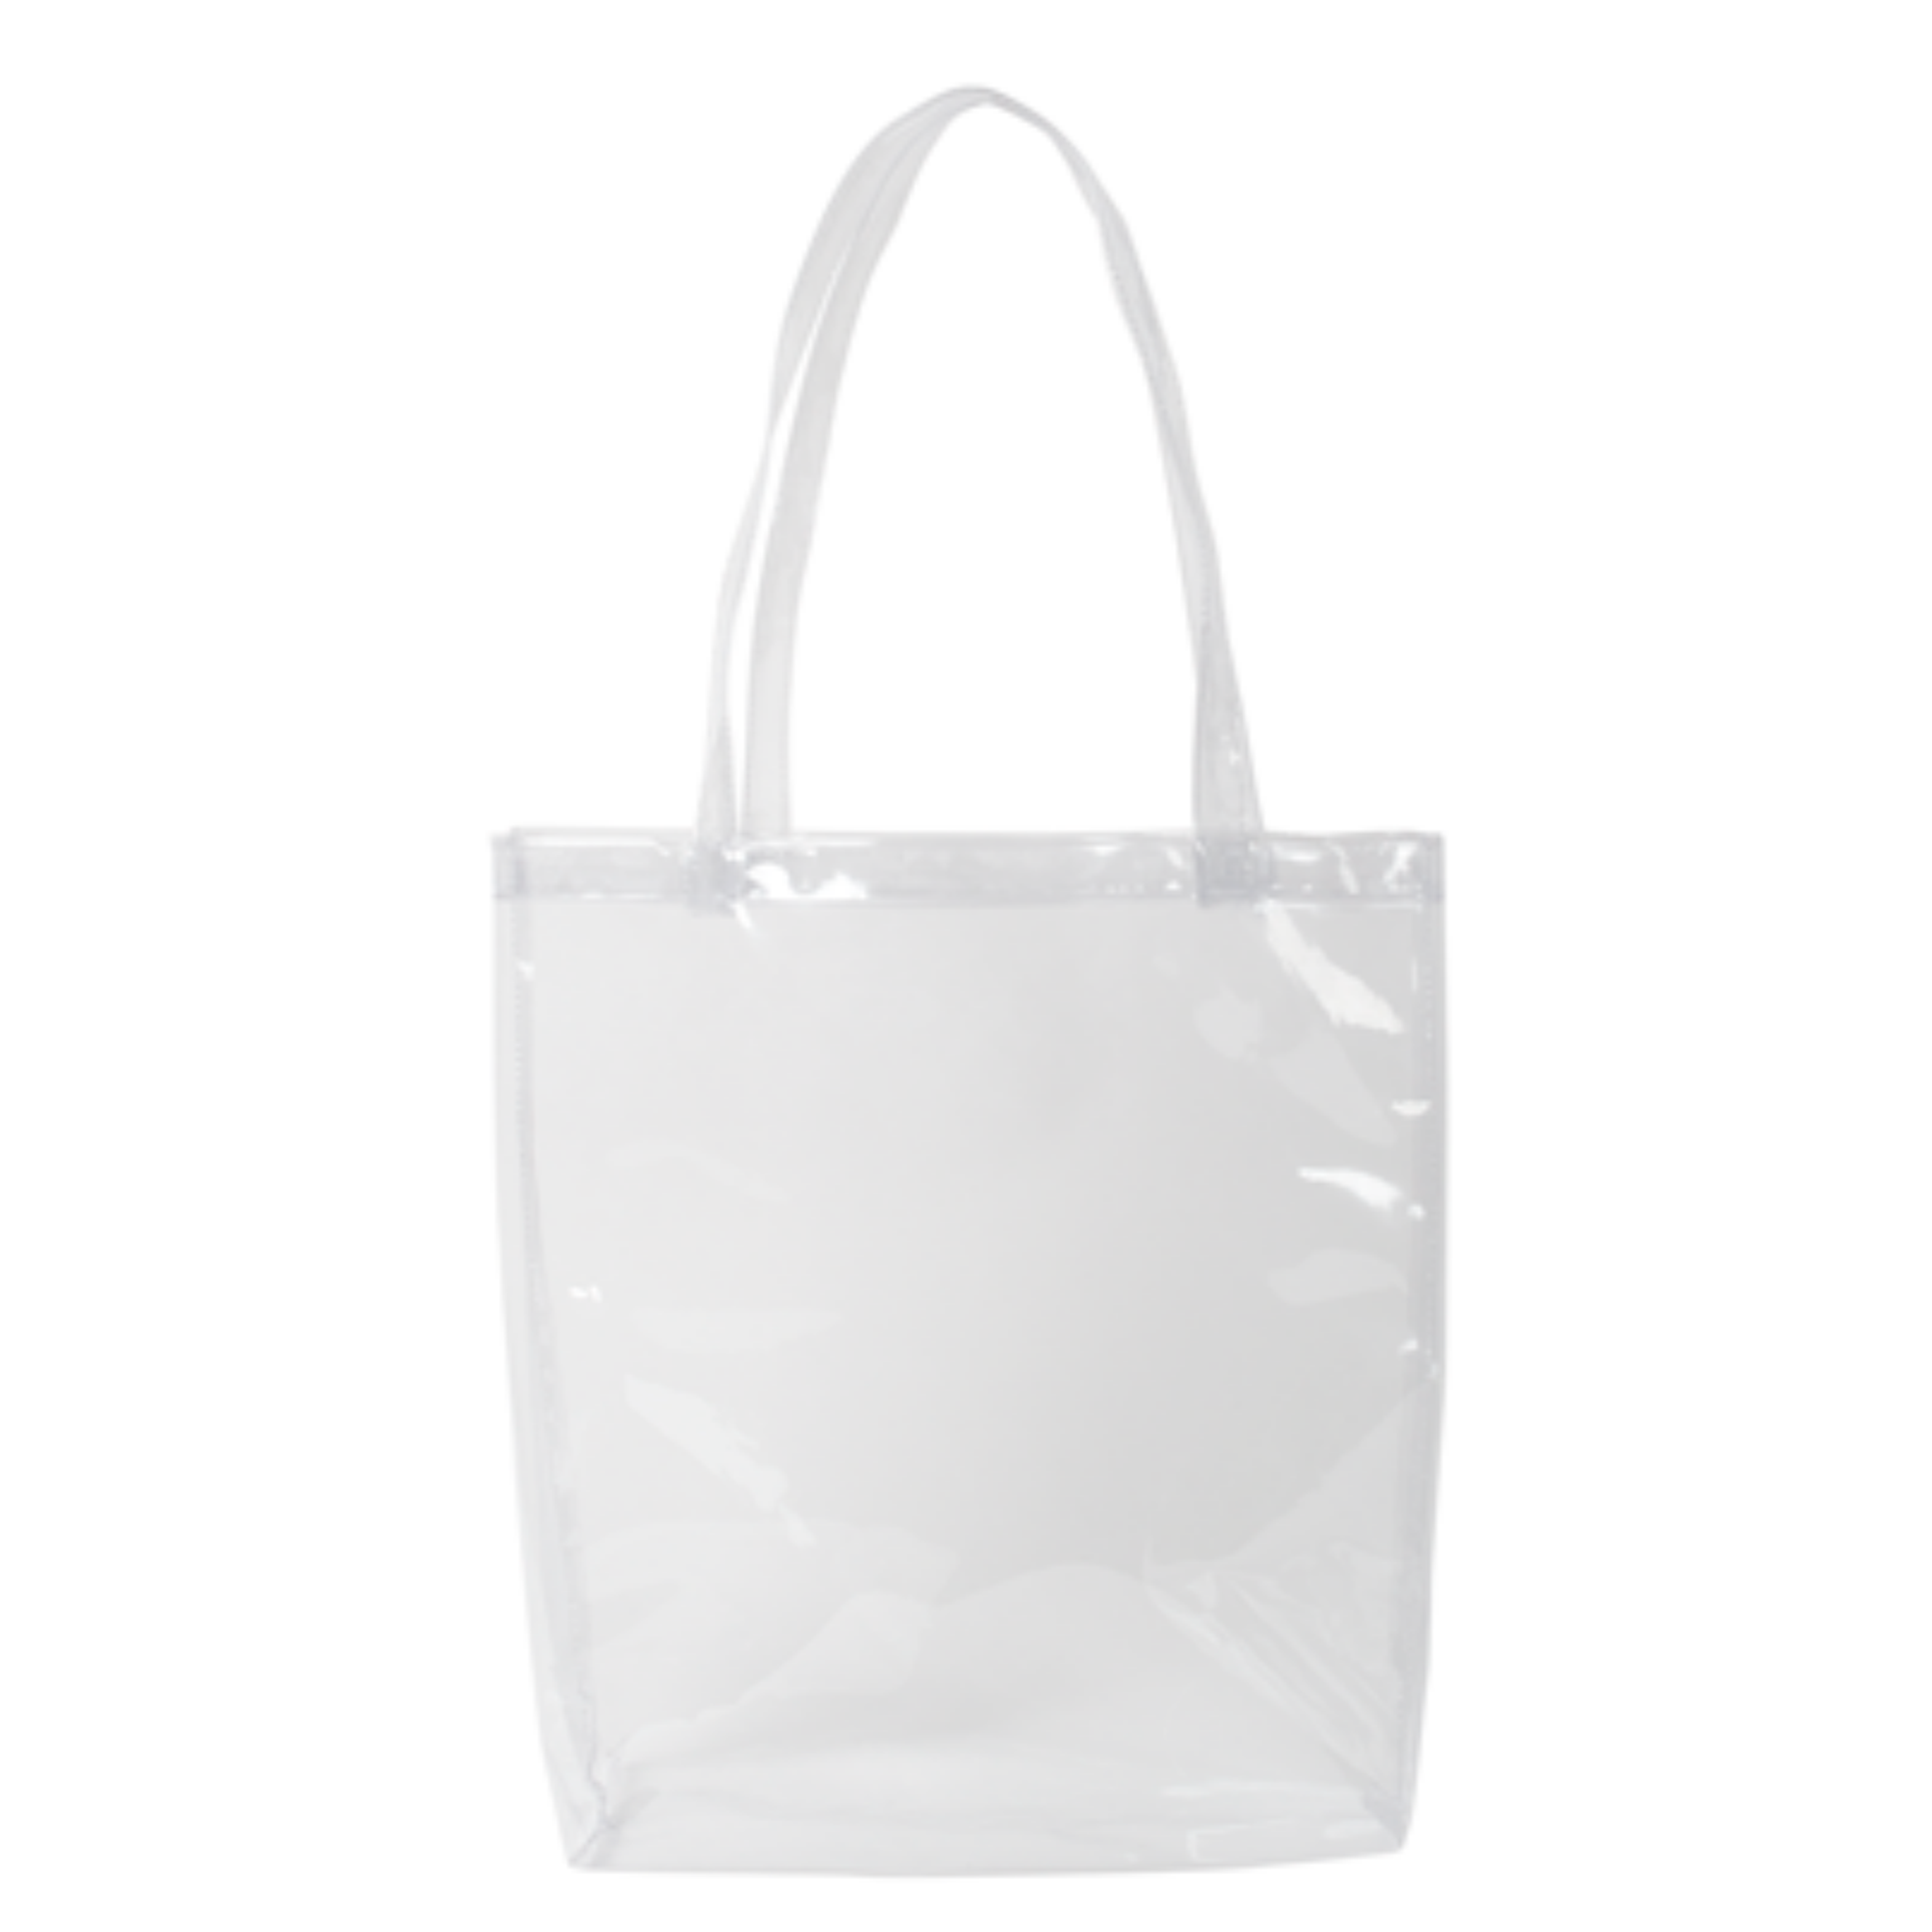 Vinyl Tote Bag Custom Branded Promotional Tote Swag Tote Bag Tote Bags For College Tote